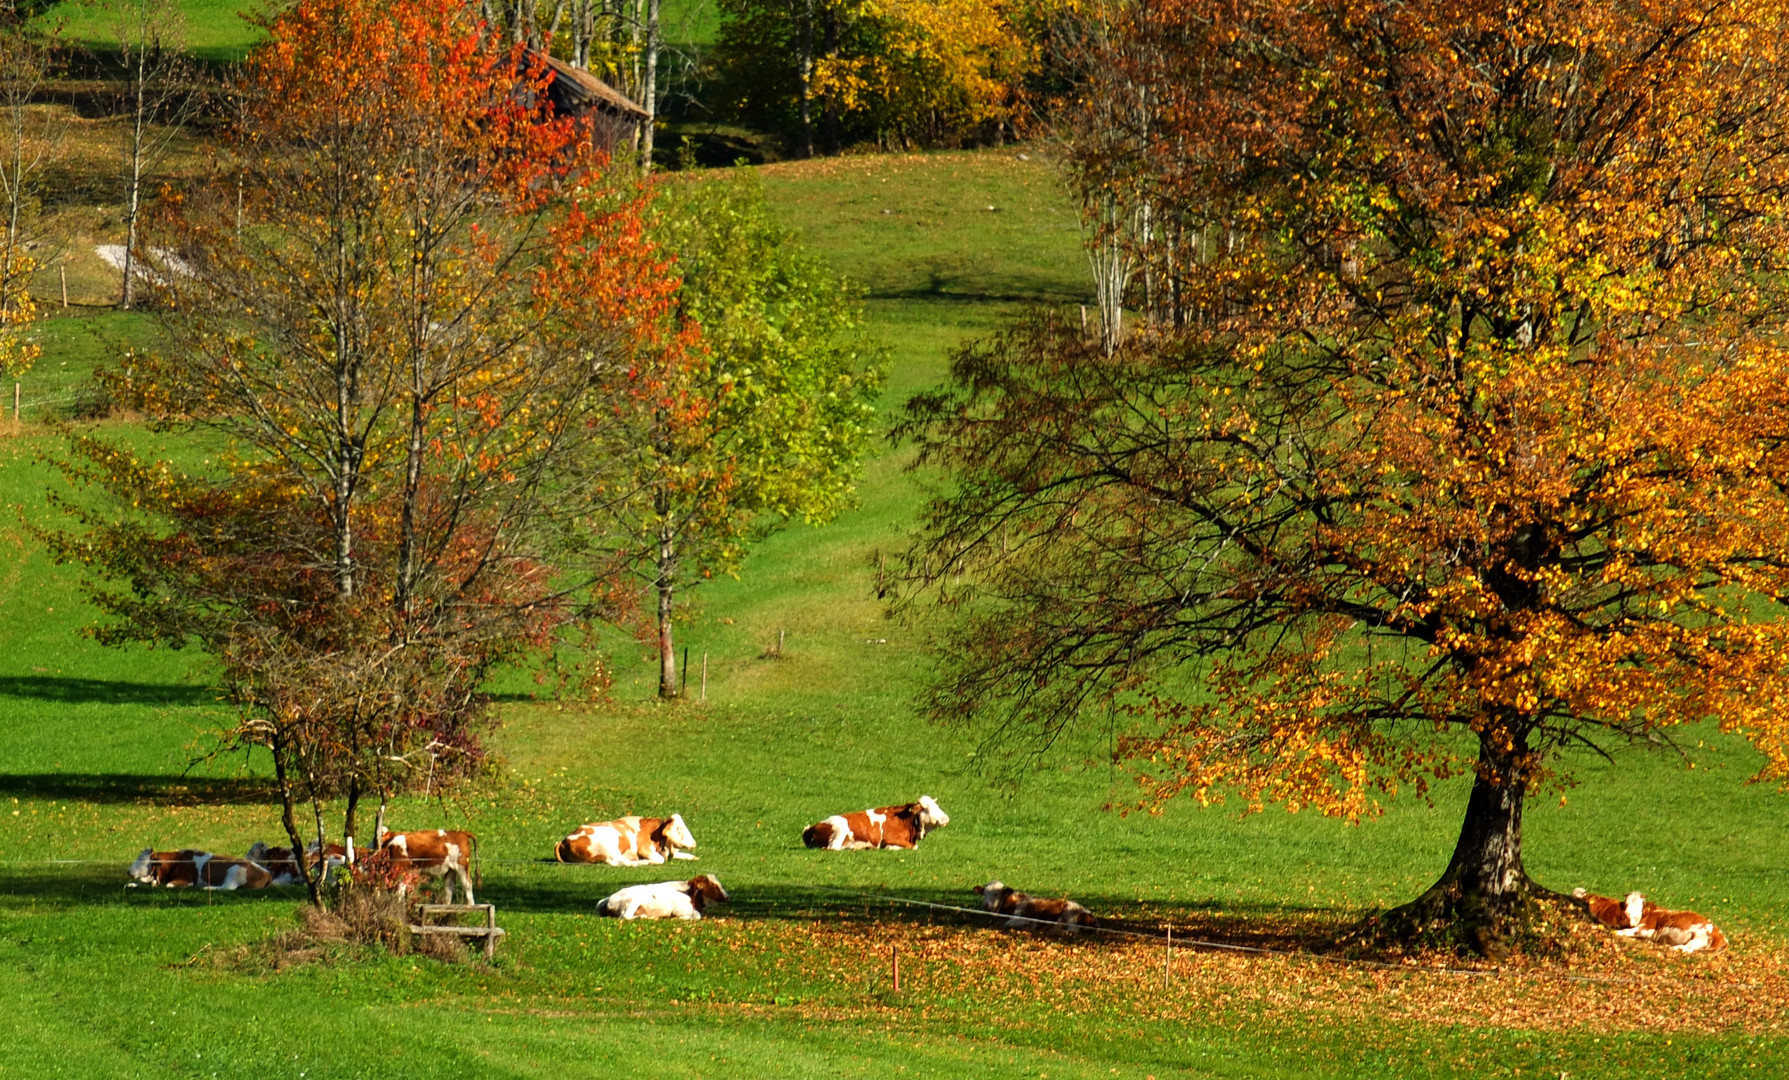 Kühe in der Herbstsonne